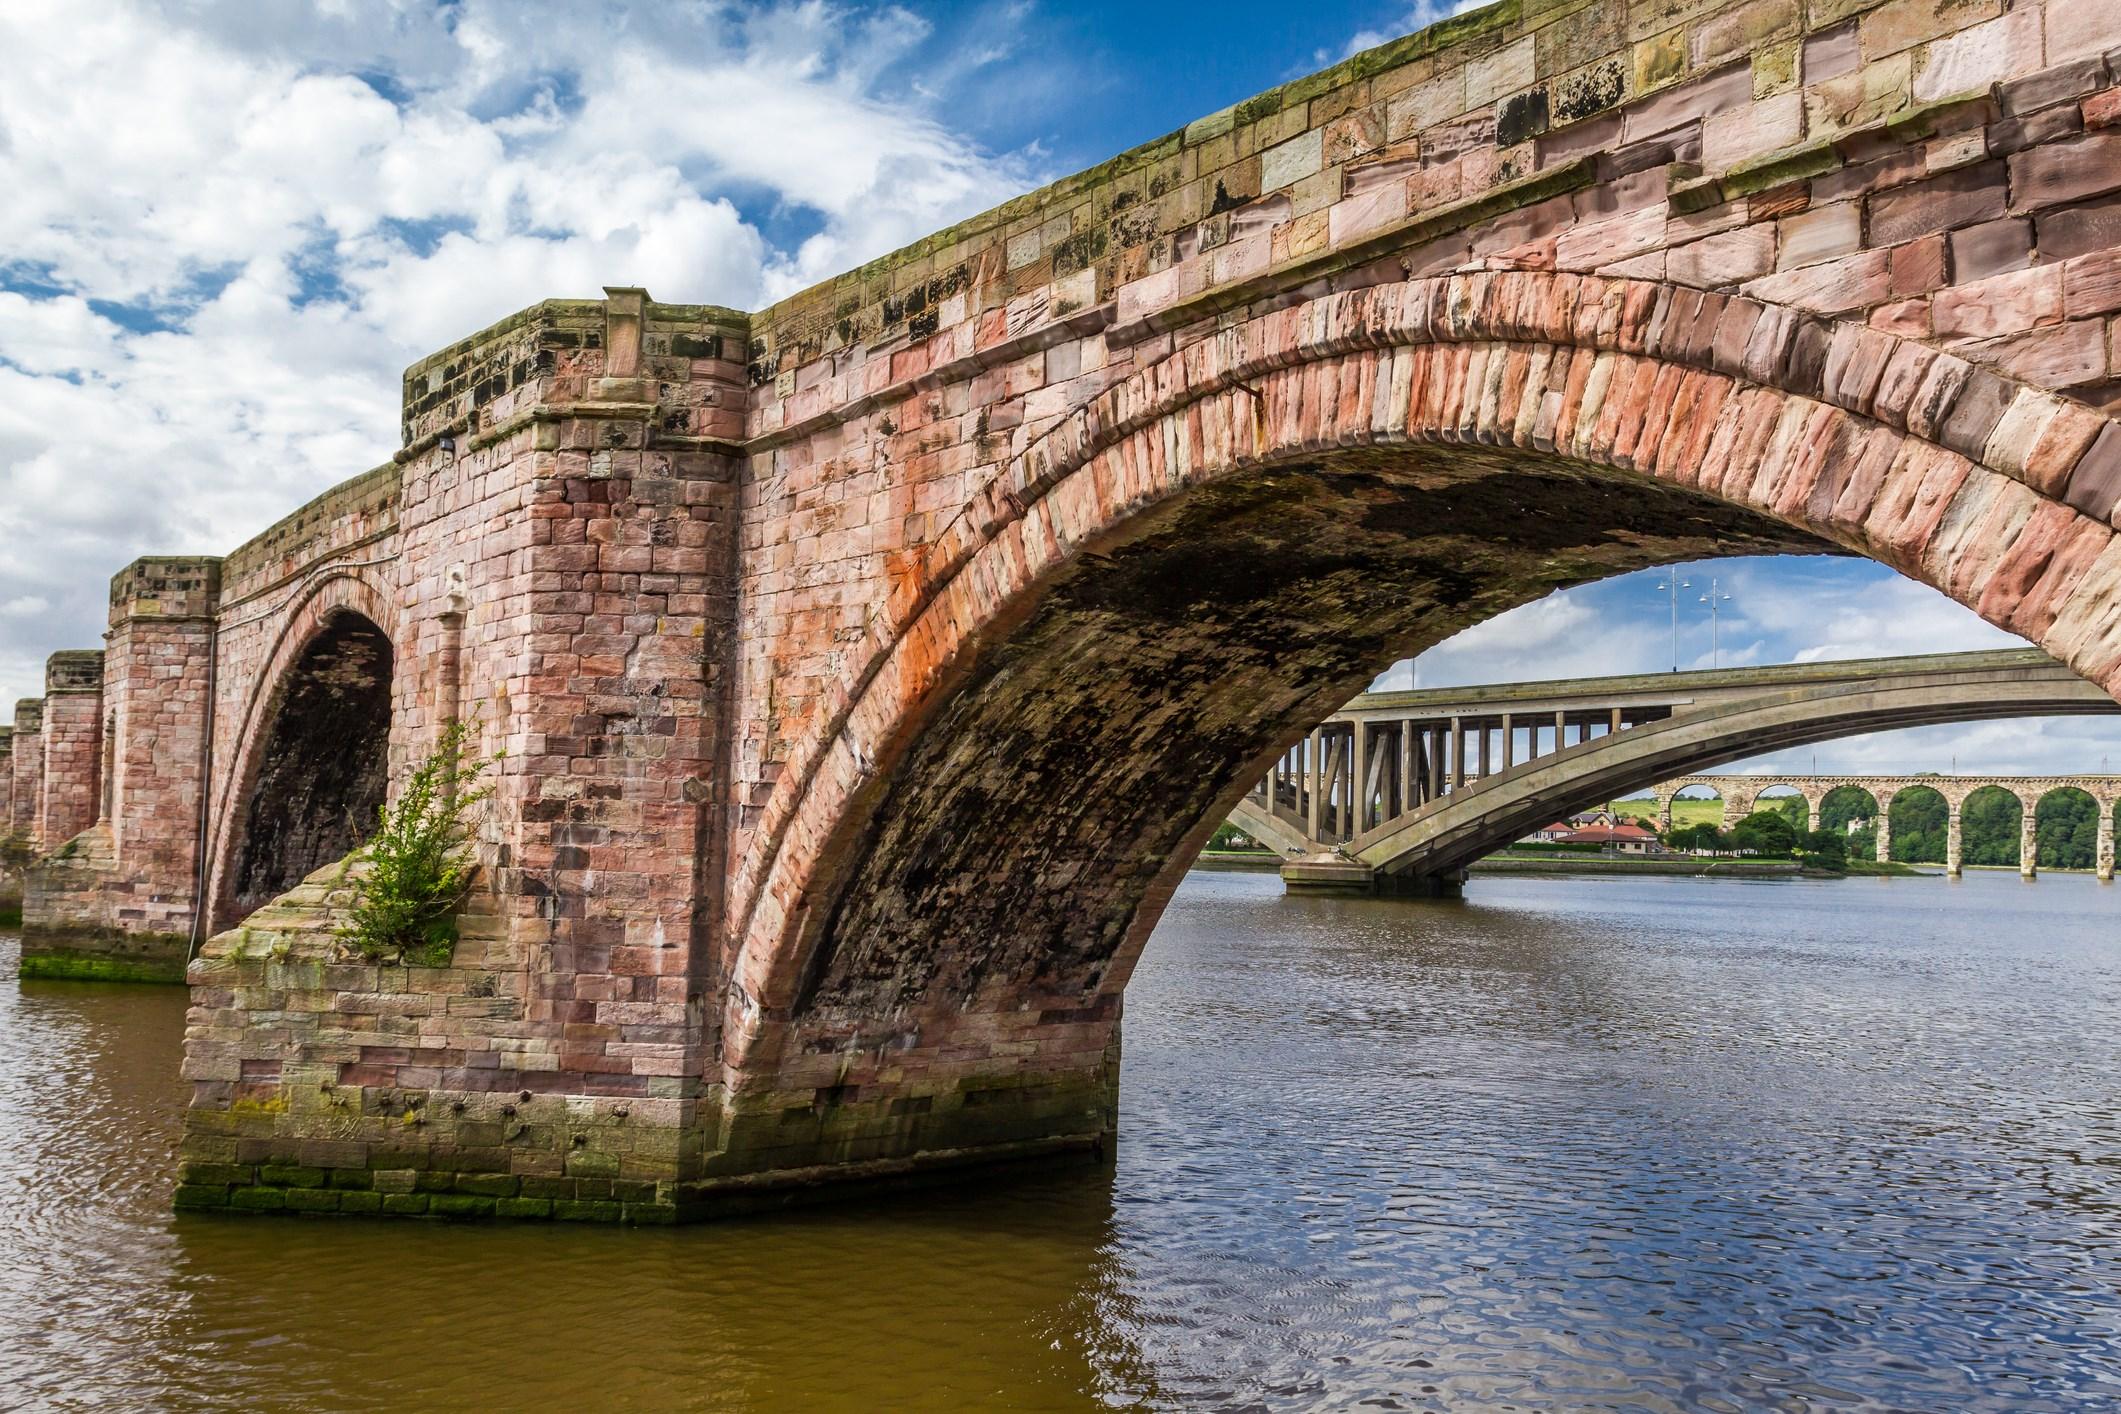 Bridges over the River Tweed at Berwick © Shaiith   dreamstime.com